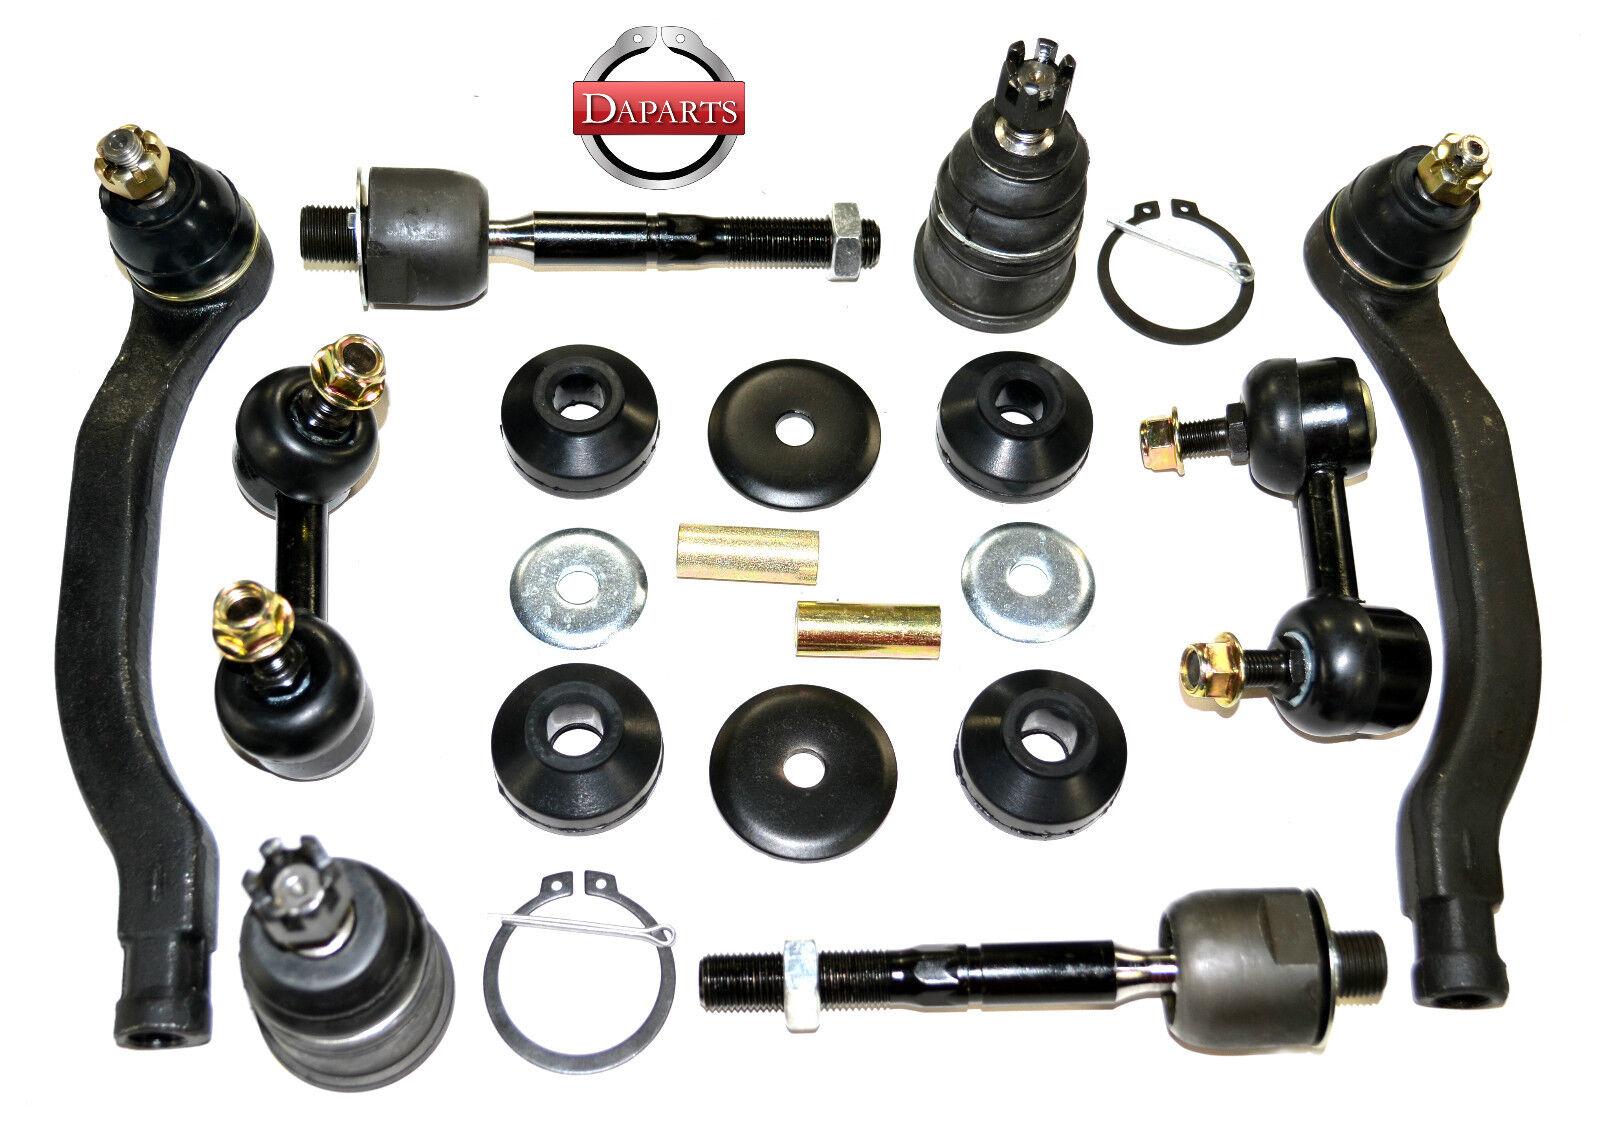 toyota tacoma rear suspension diagram  toyota  free engine